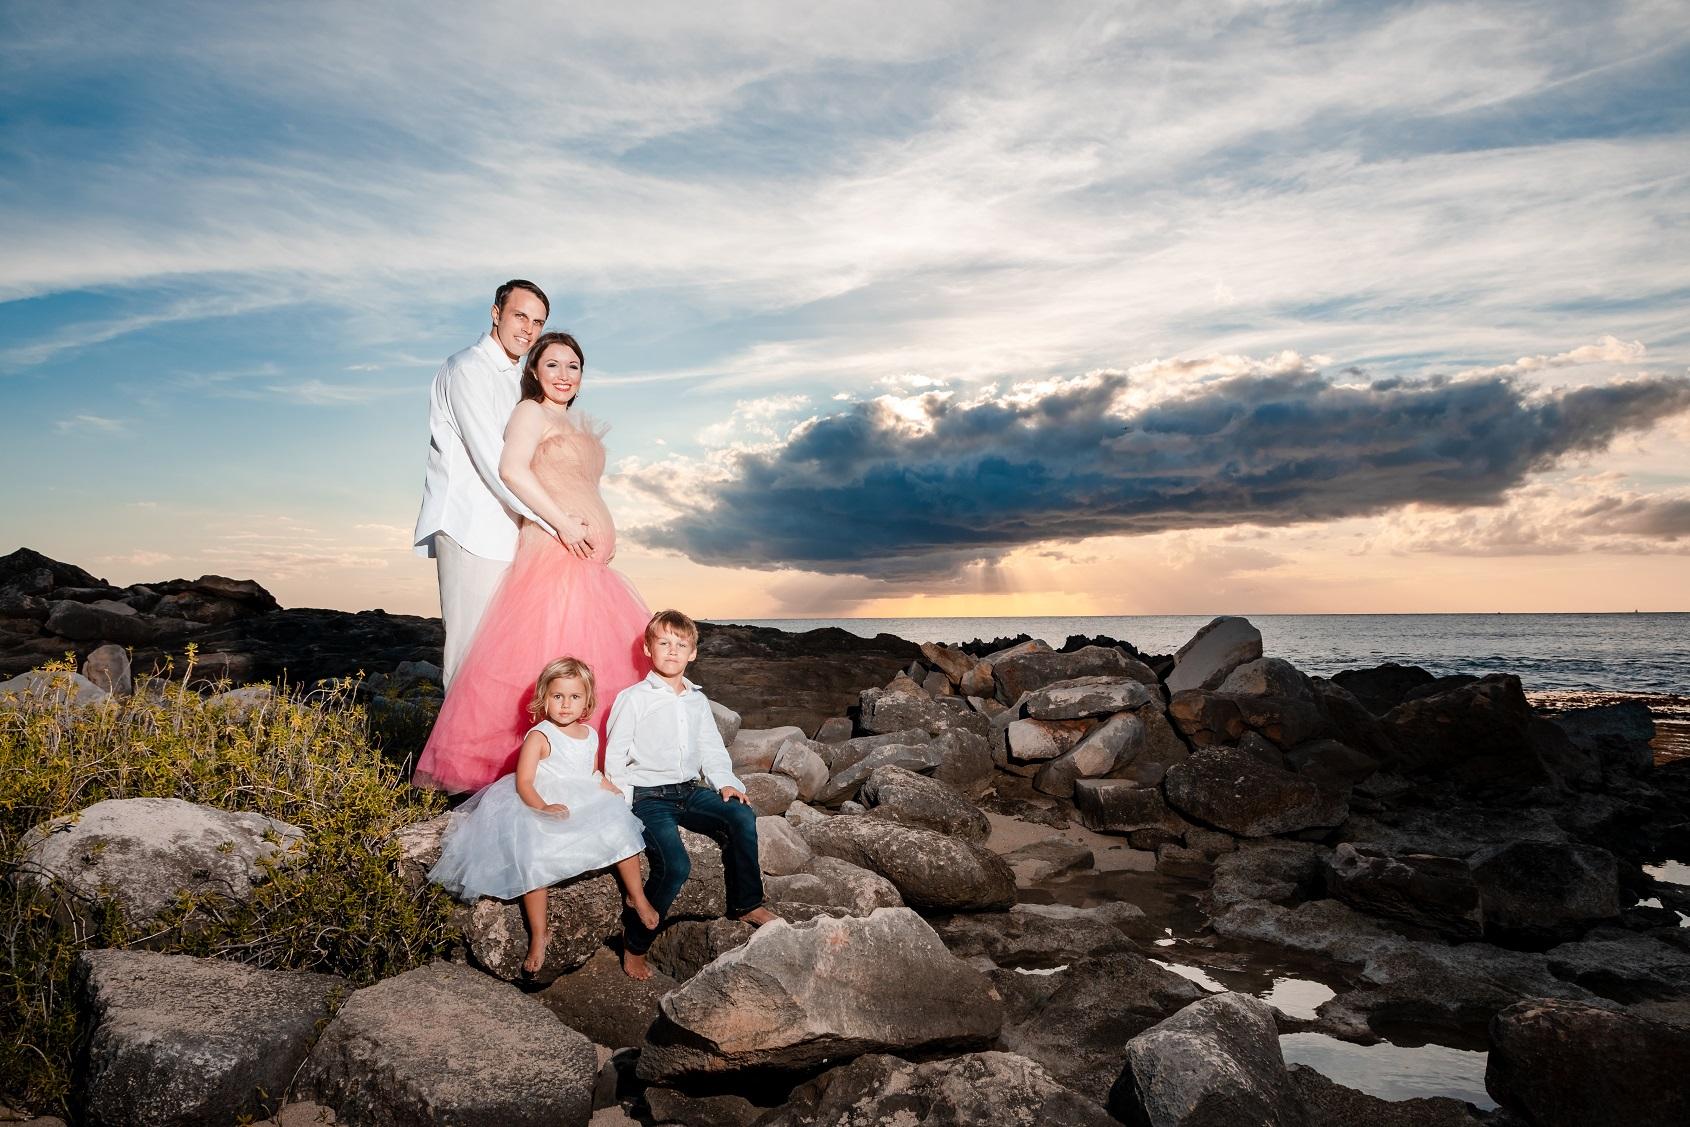 oahu hawaii family sunset beach portrait photographer